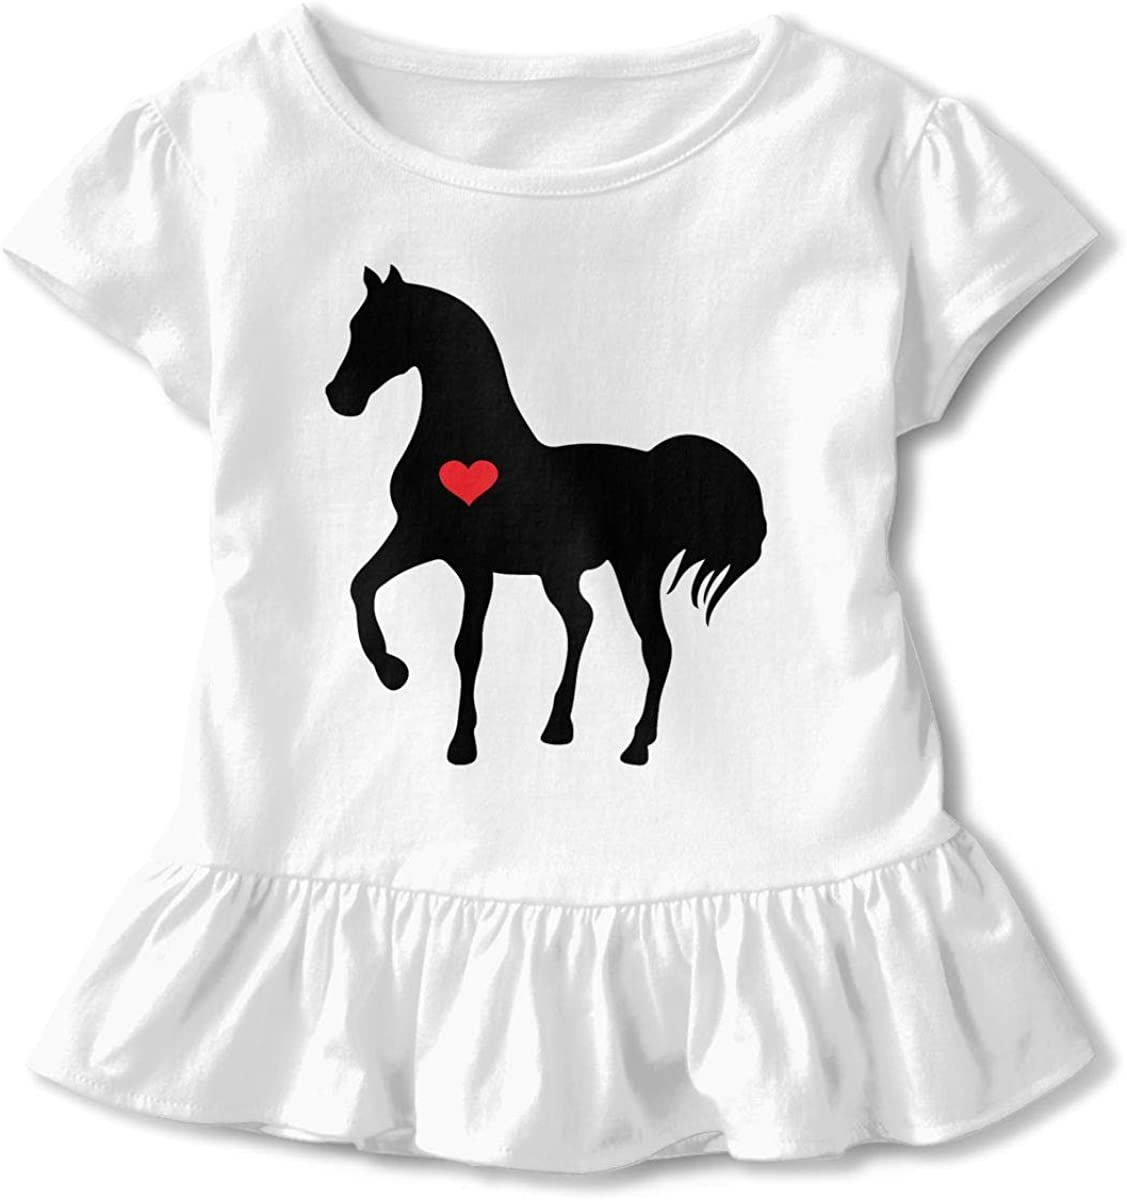 Heart Horse Red Kids Children Crew Neck T-Shirt Pullovers